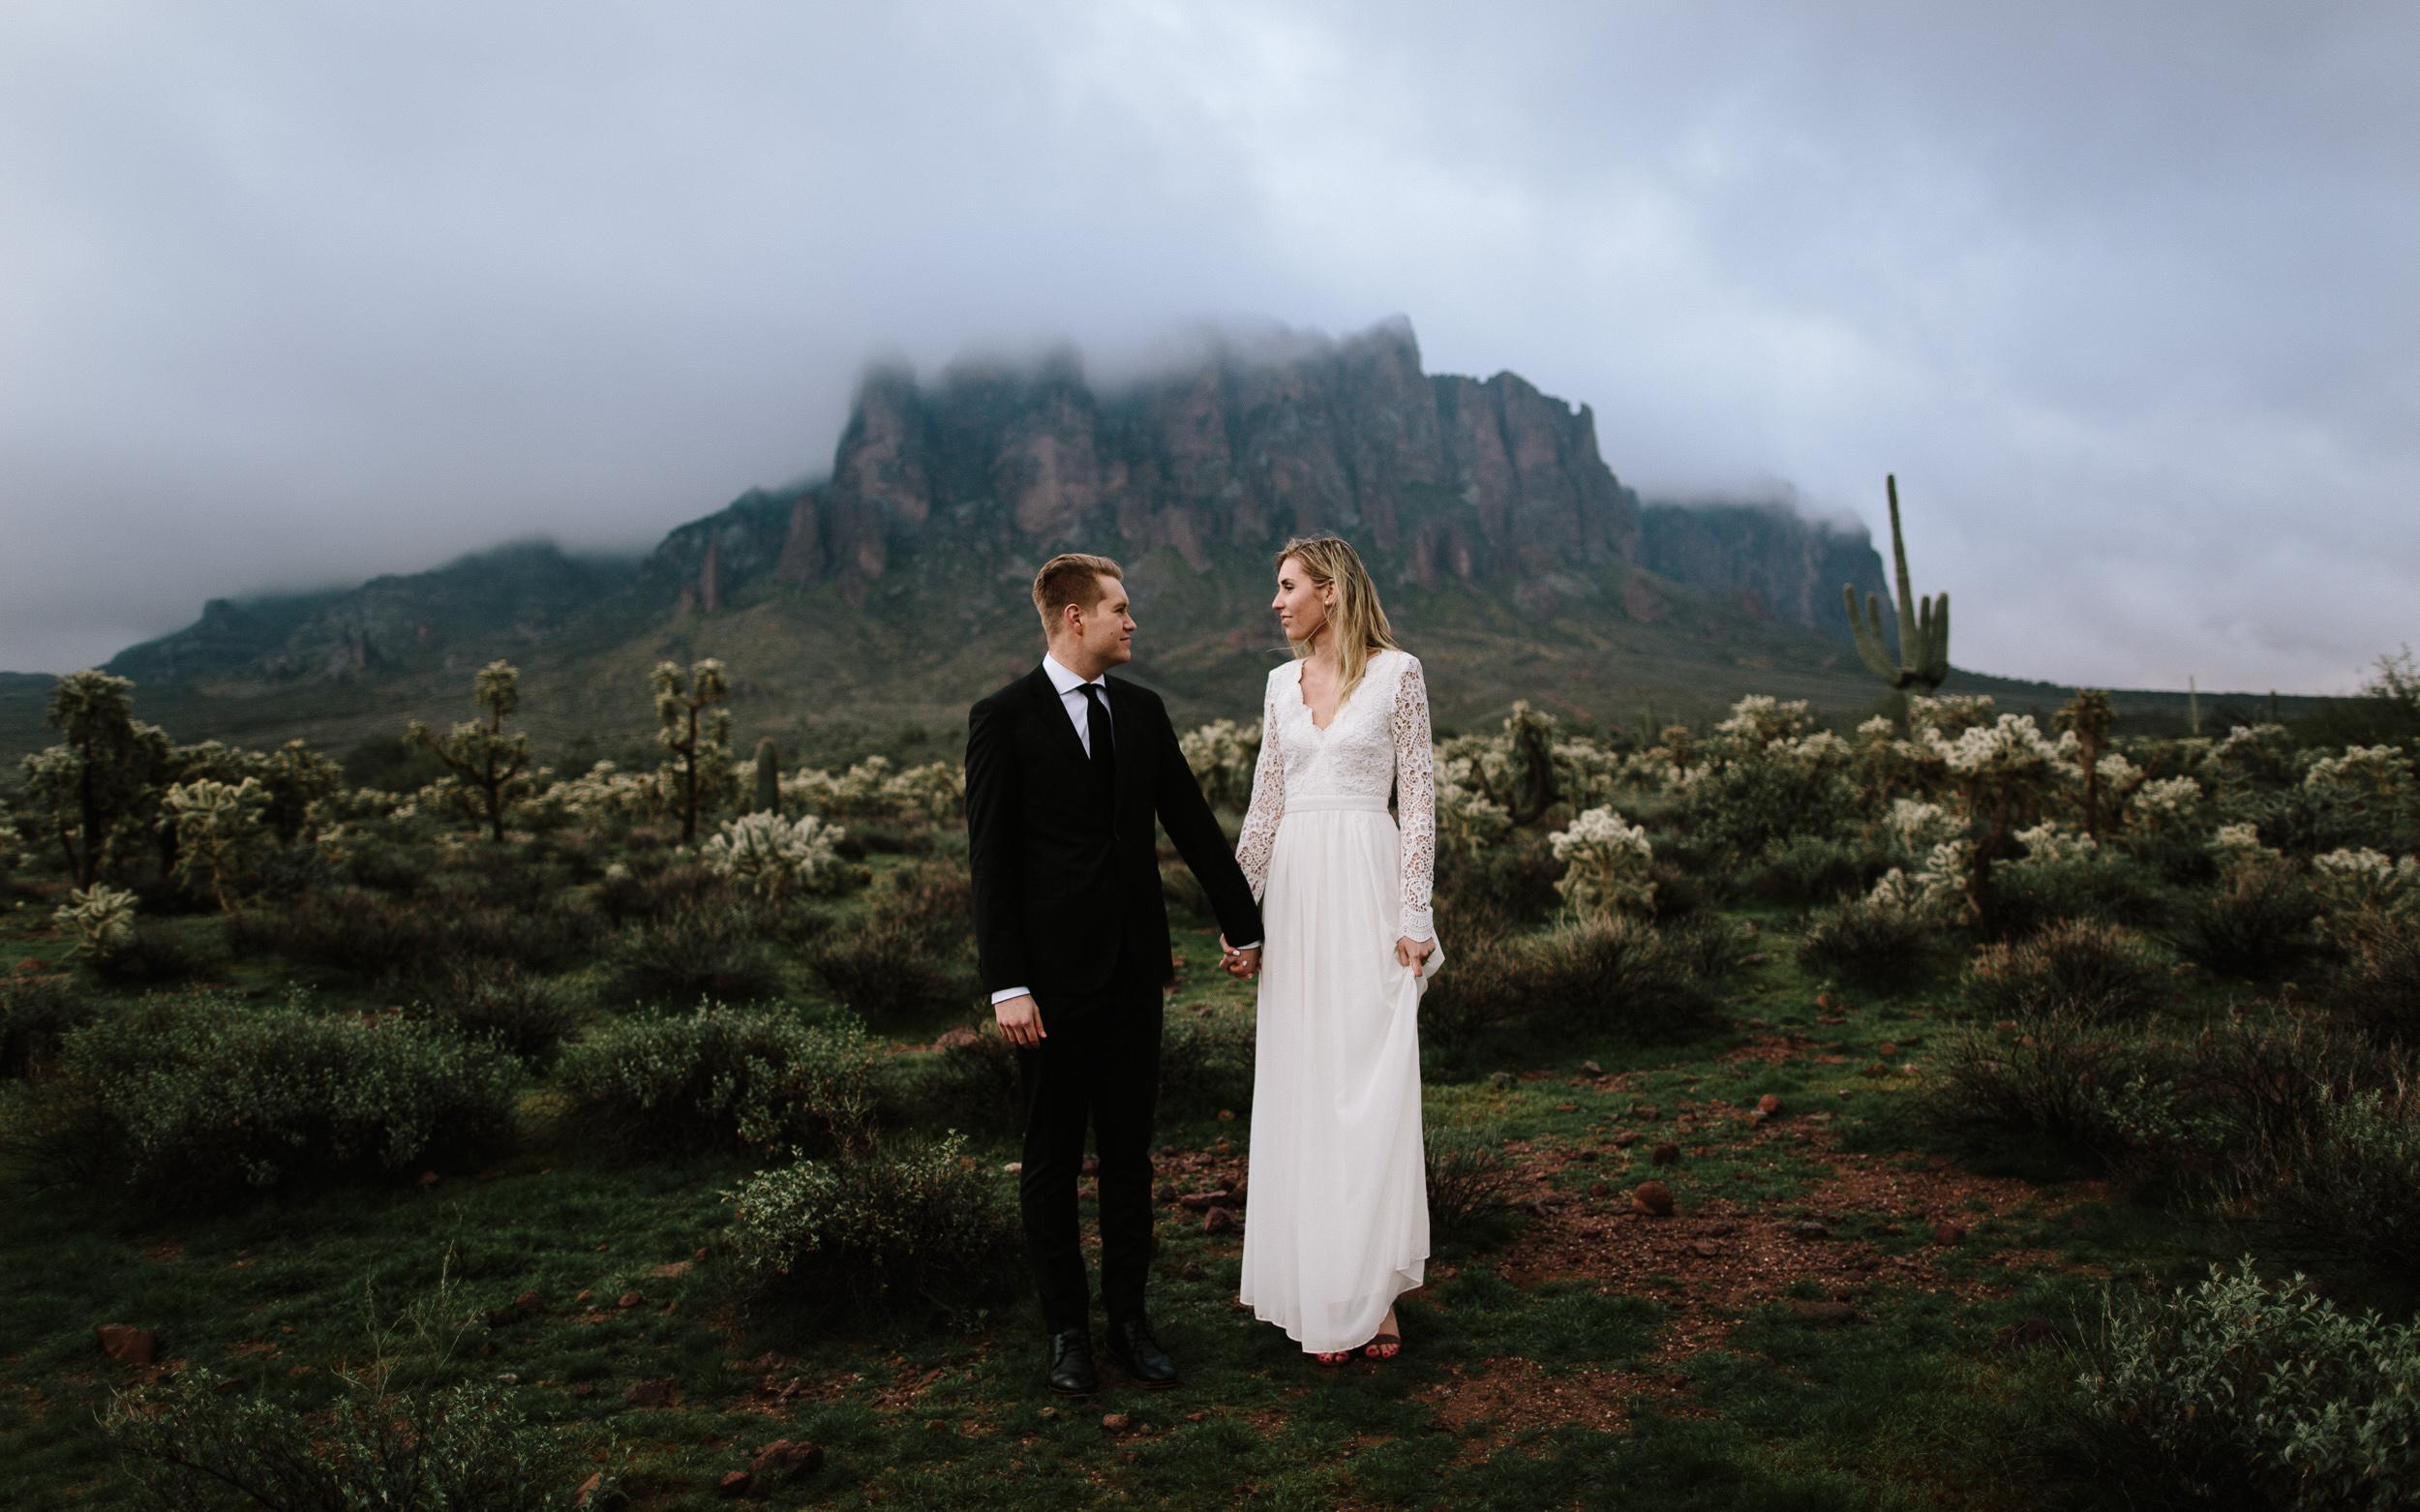 phoenix-mesa-elopement-wedding-photographer-lost-dutchman-state-park-superstitious-mountains-15.jpg